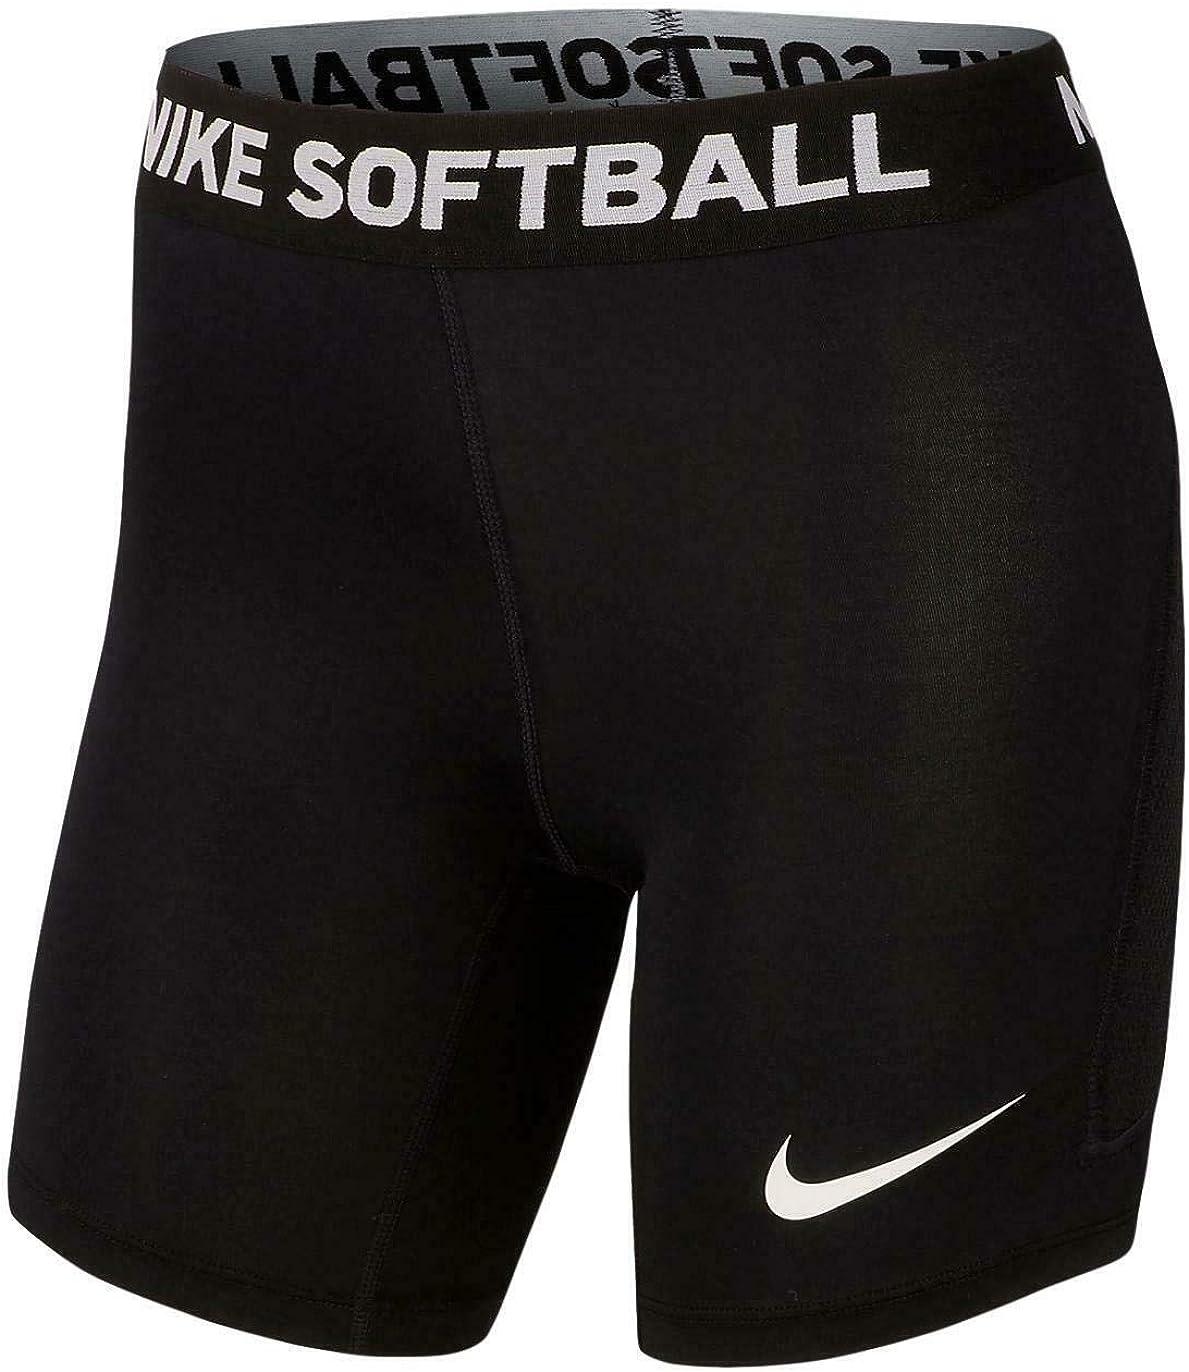 Nike Girls Dri-Fit Softball Slider Compression Shorts